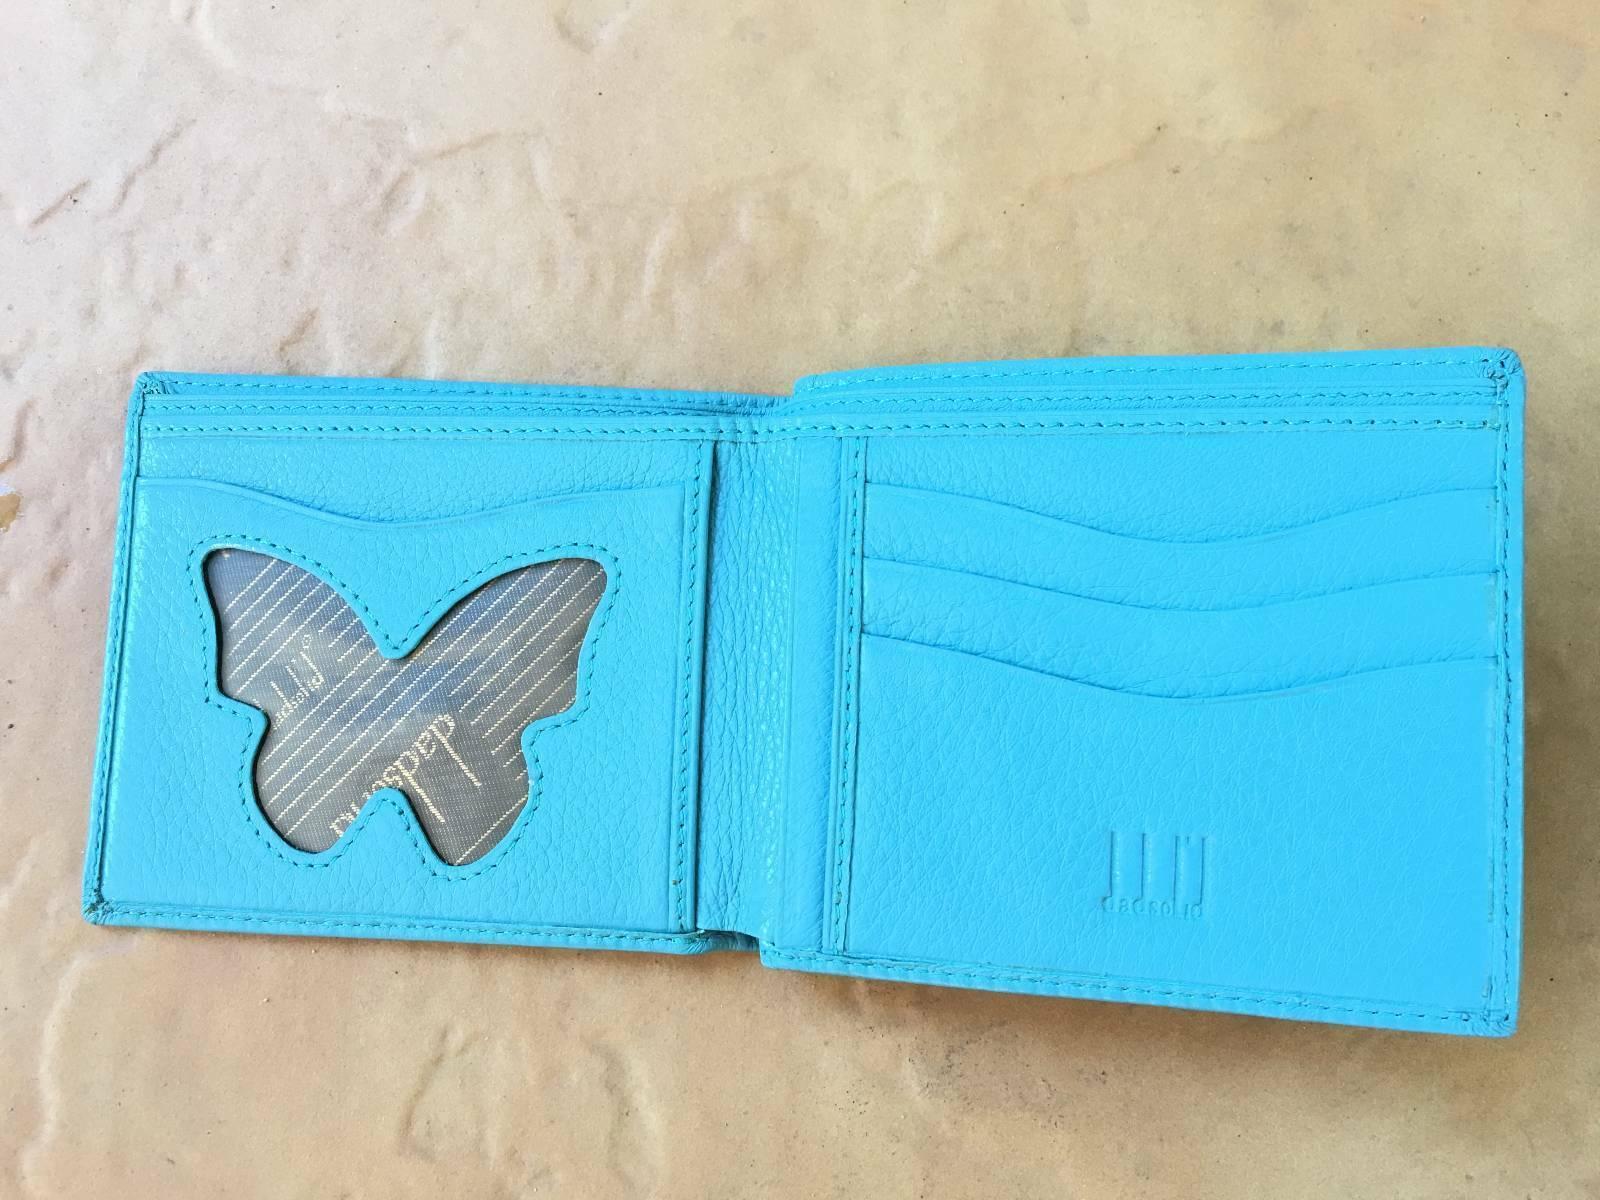 ITALY DESIGNER leather butterfly powder blue wallet School Work Uni Office Xmas